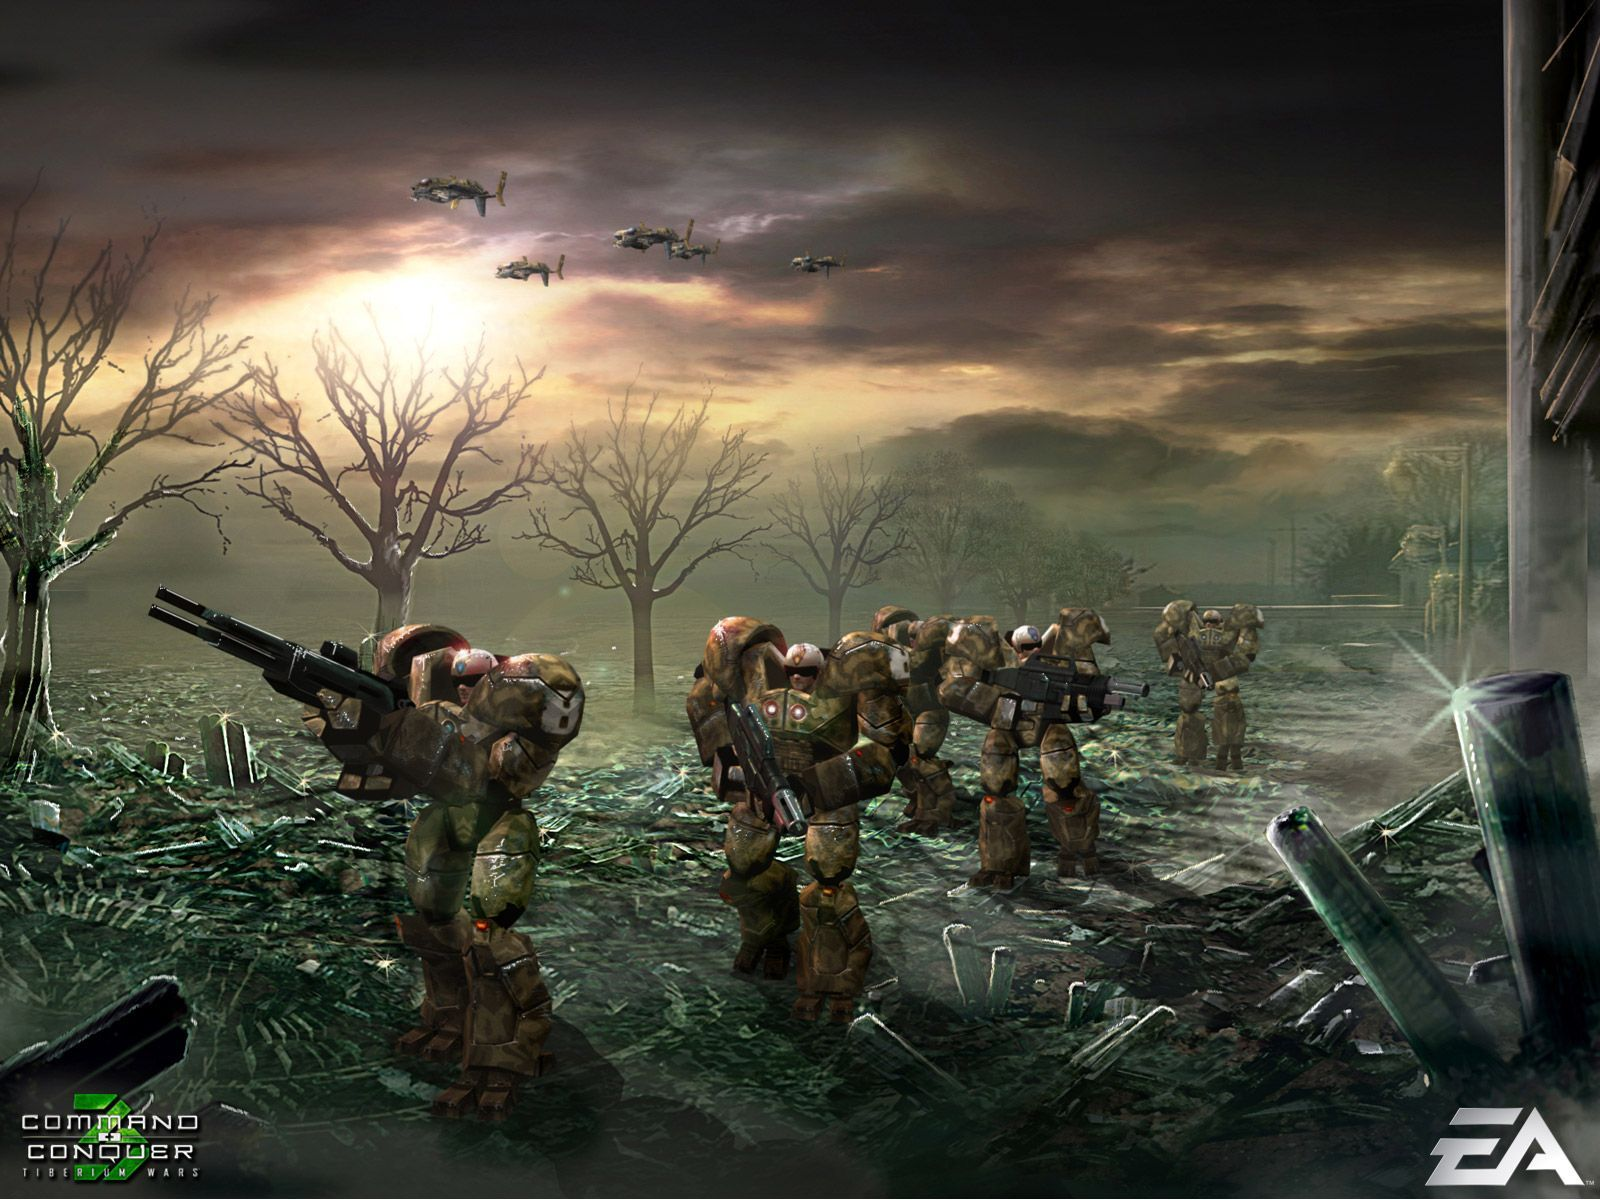 Command-Conquer-Kanes-WrathTiberium-Wars-Repack-wallpaper-wp3404070